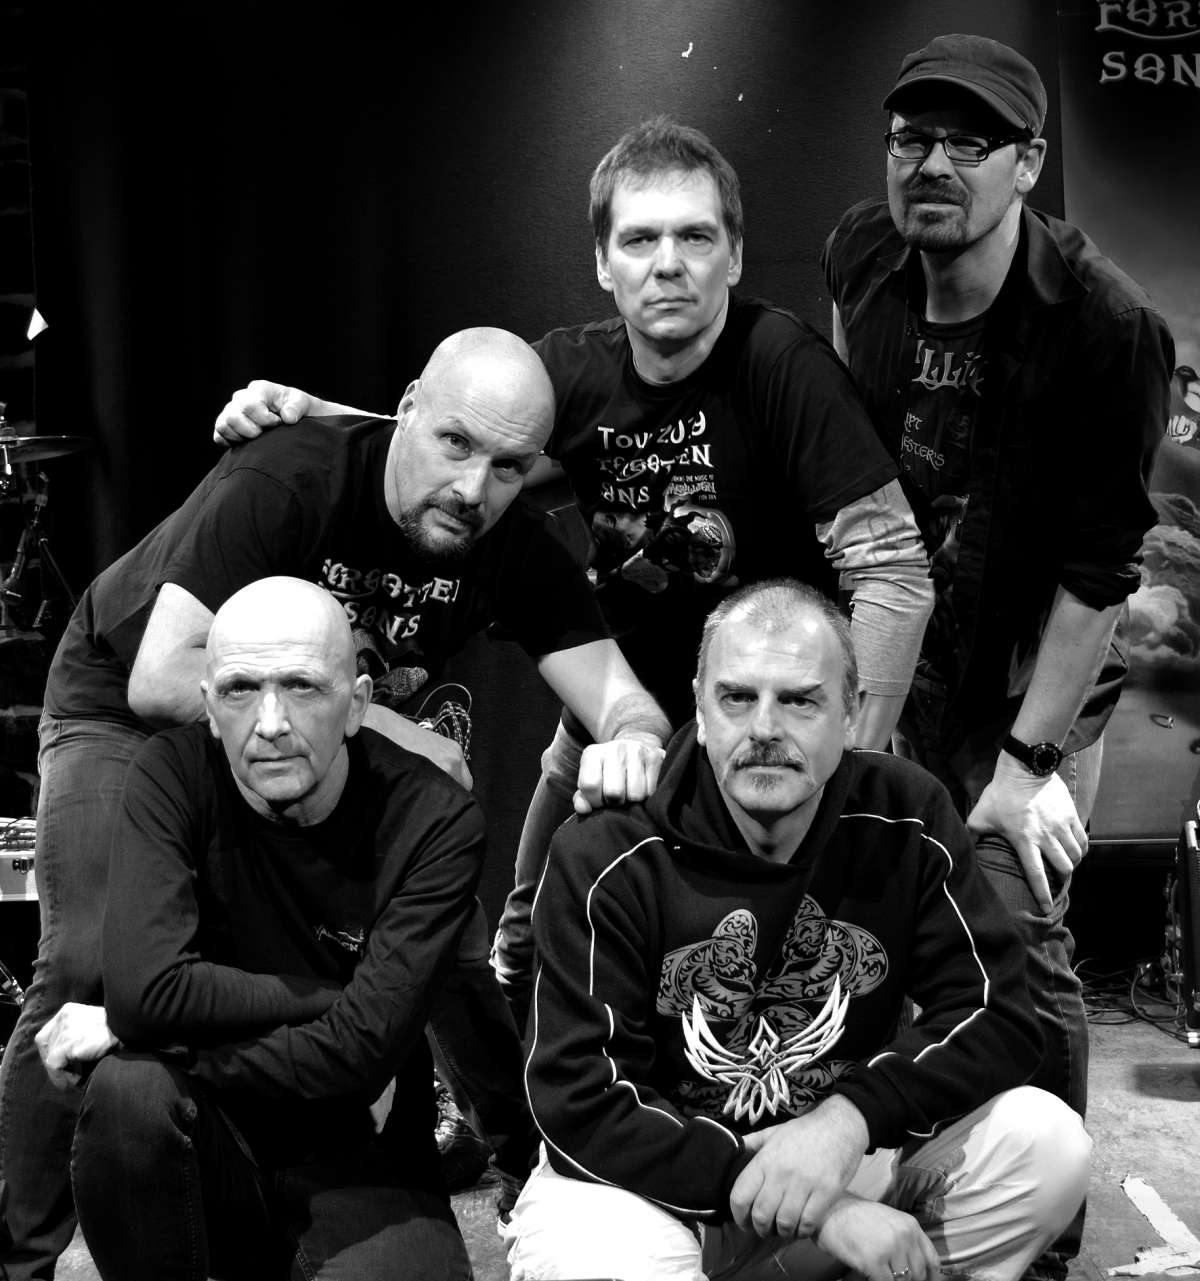 A Tribute To Marillion´s Fish Ära  - Forgotten Sons - Kulturzentrum Franzis  - Wetzlar